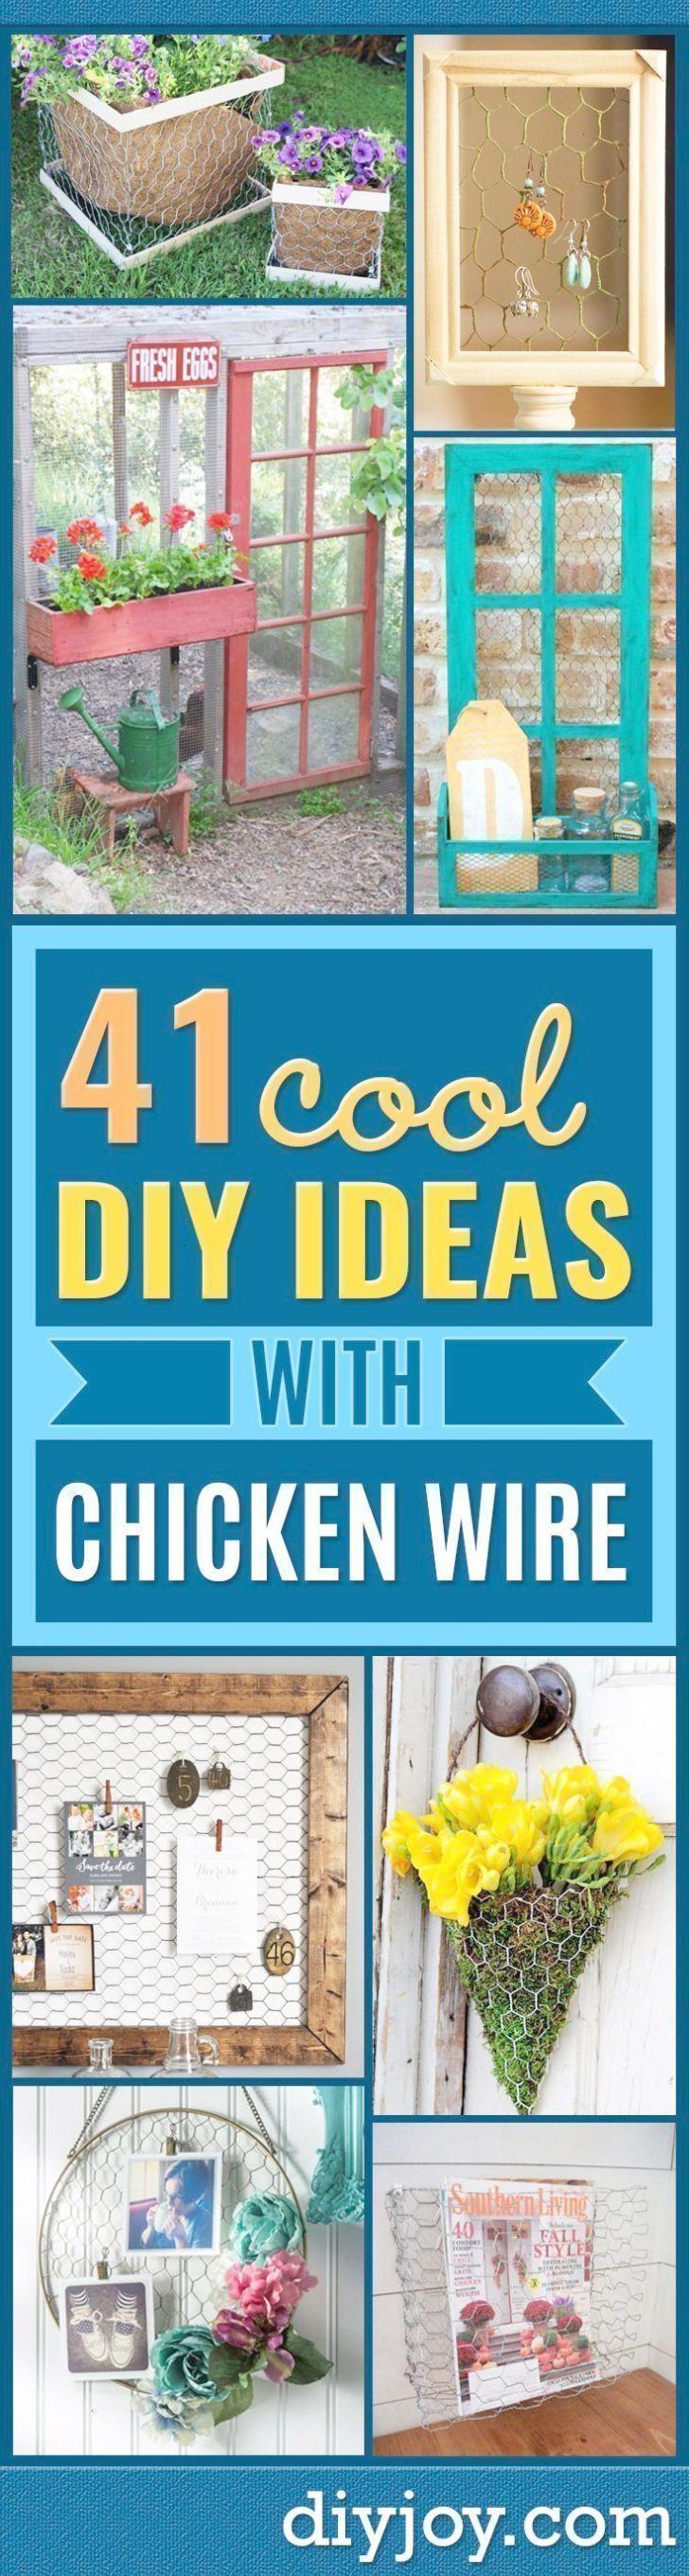 Best Diy Ideas With Chicken Wire  Rustic Farmhouse Decor